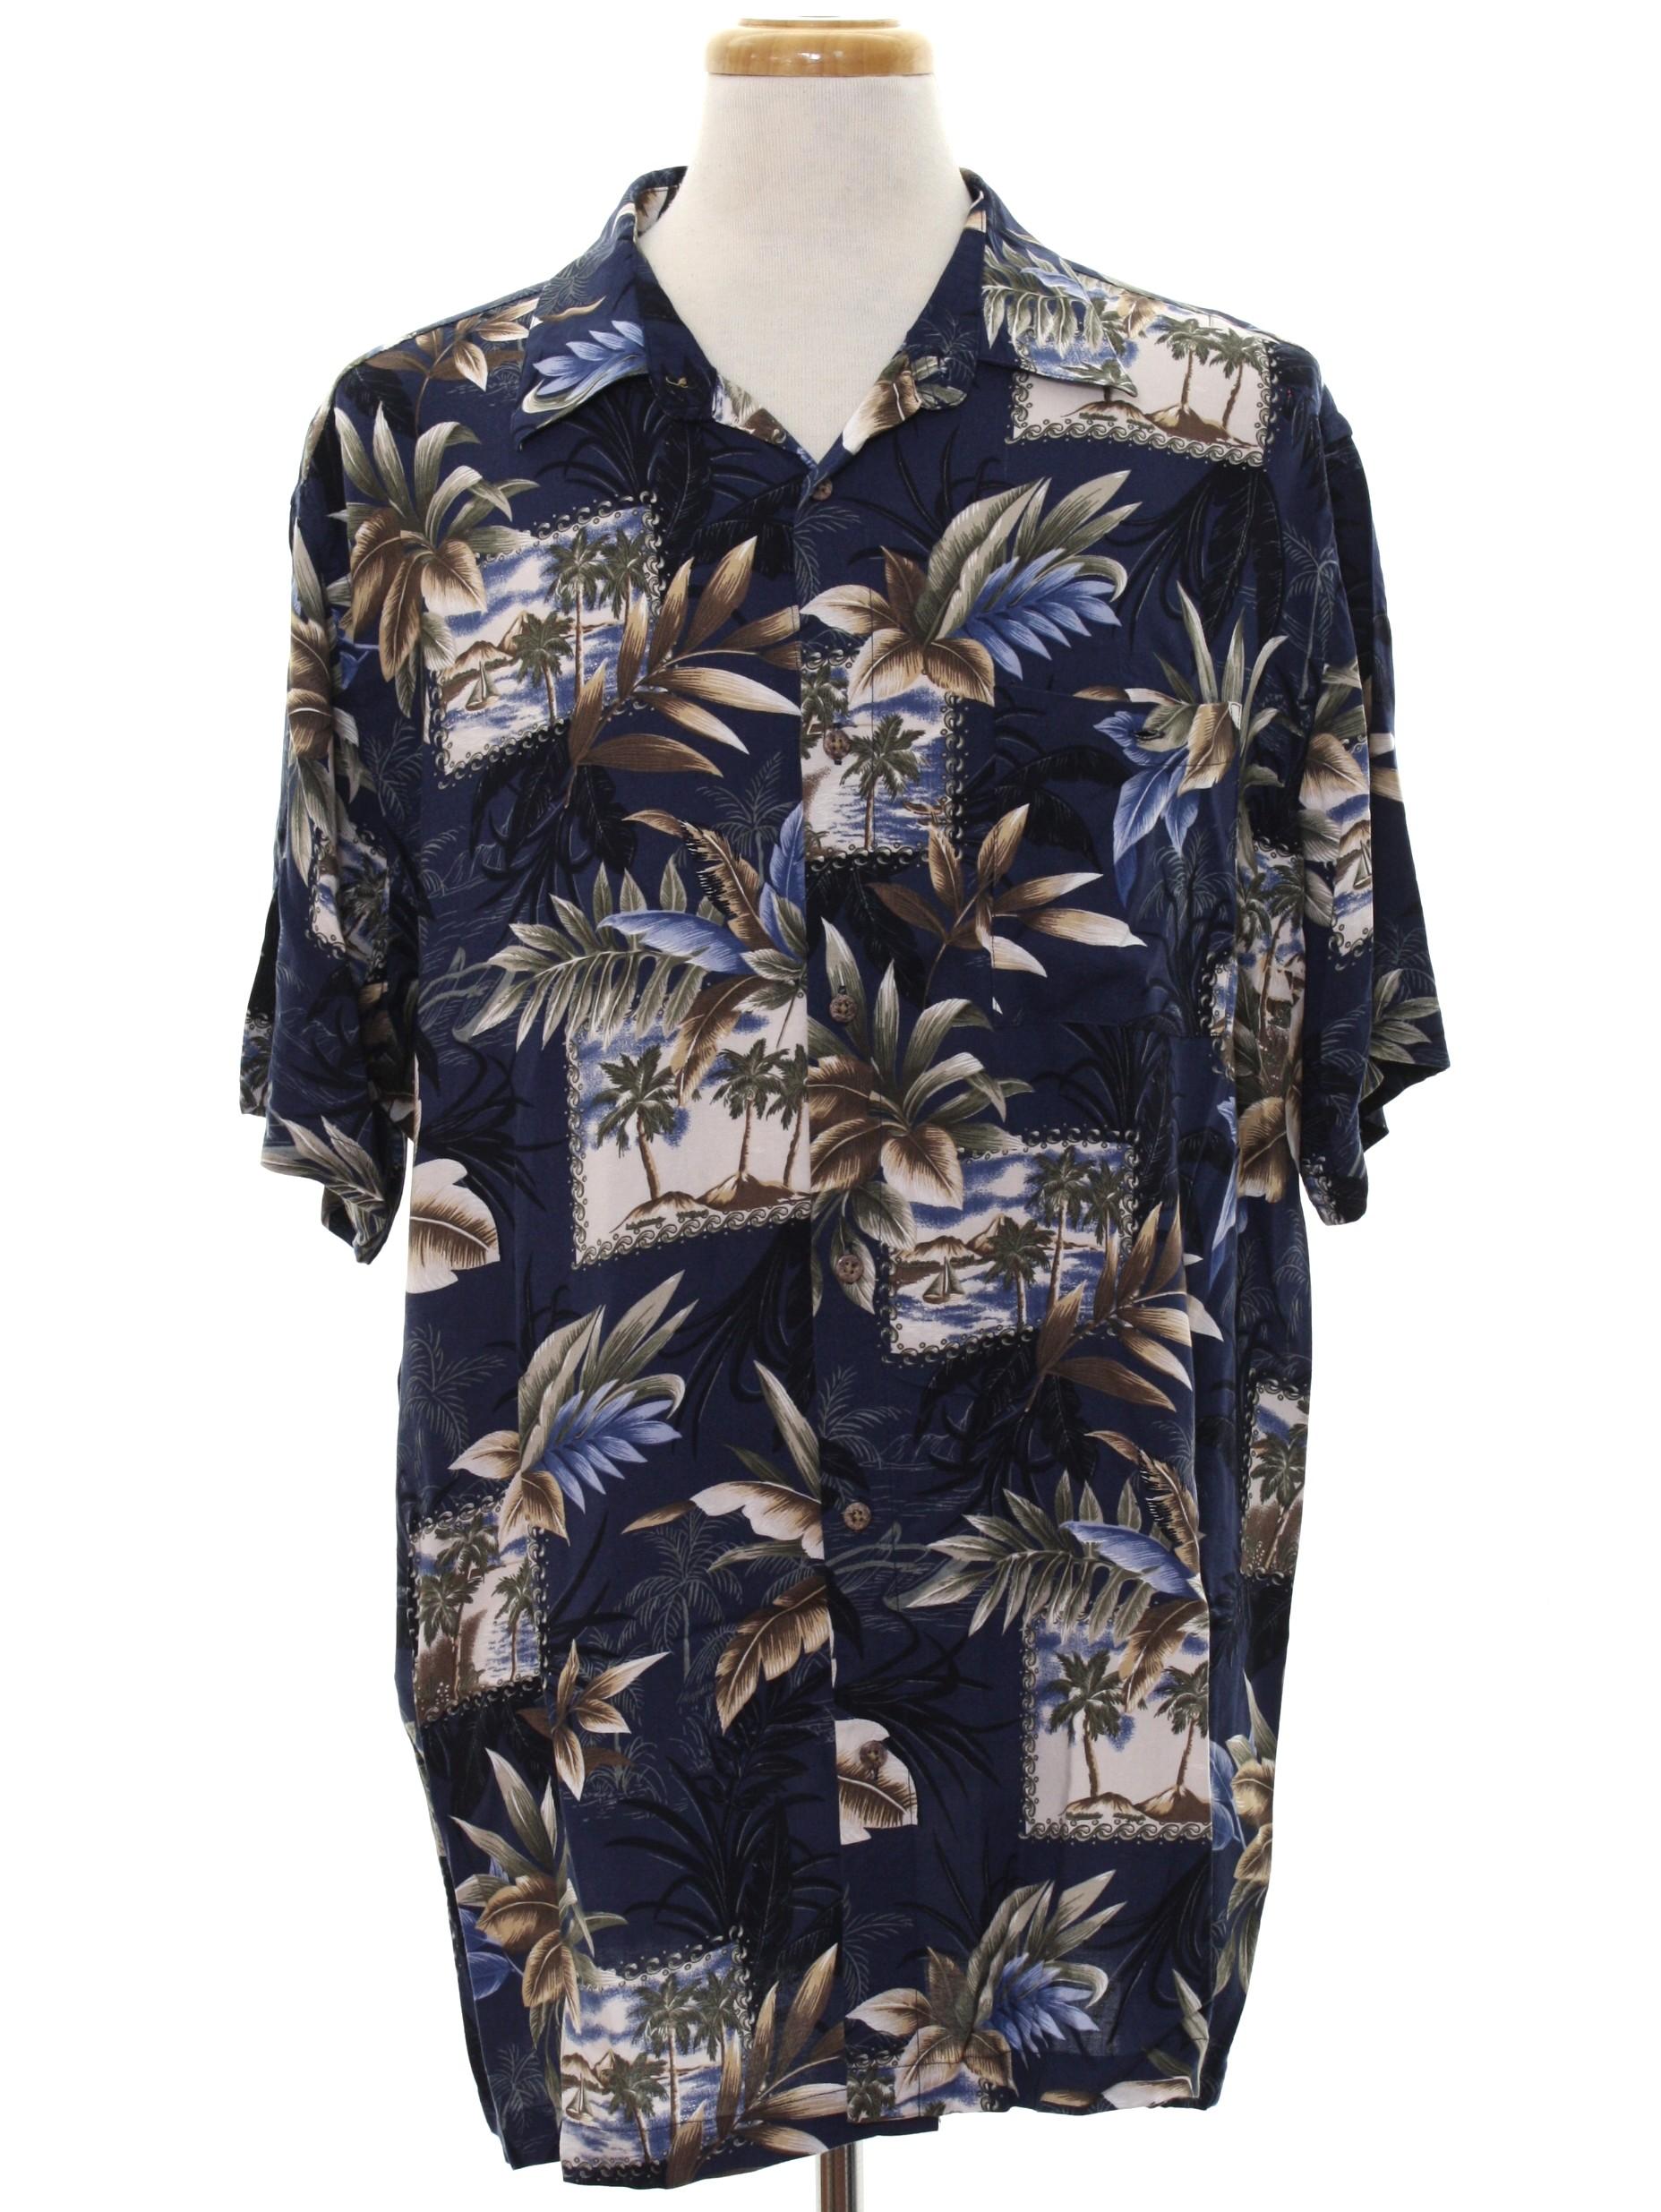 90e44259 Retro 1990's Hawaiian Shirt (David Taylor Collection) : 90s -David Taylor  Collection- Mens plum background, white, brown, black sand, tan, ...